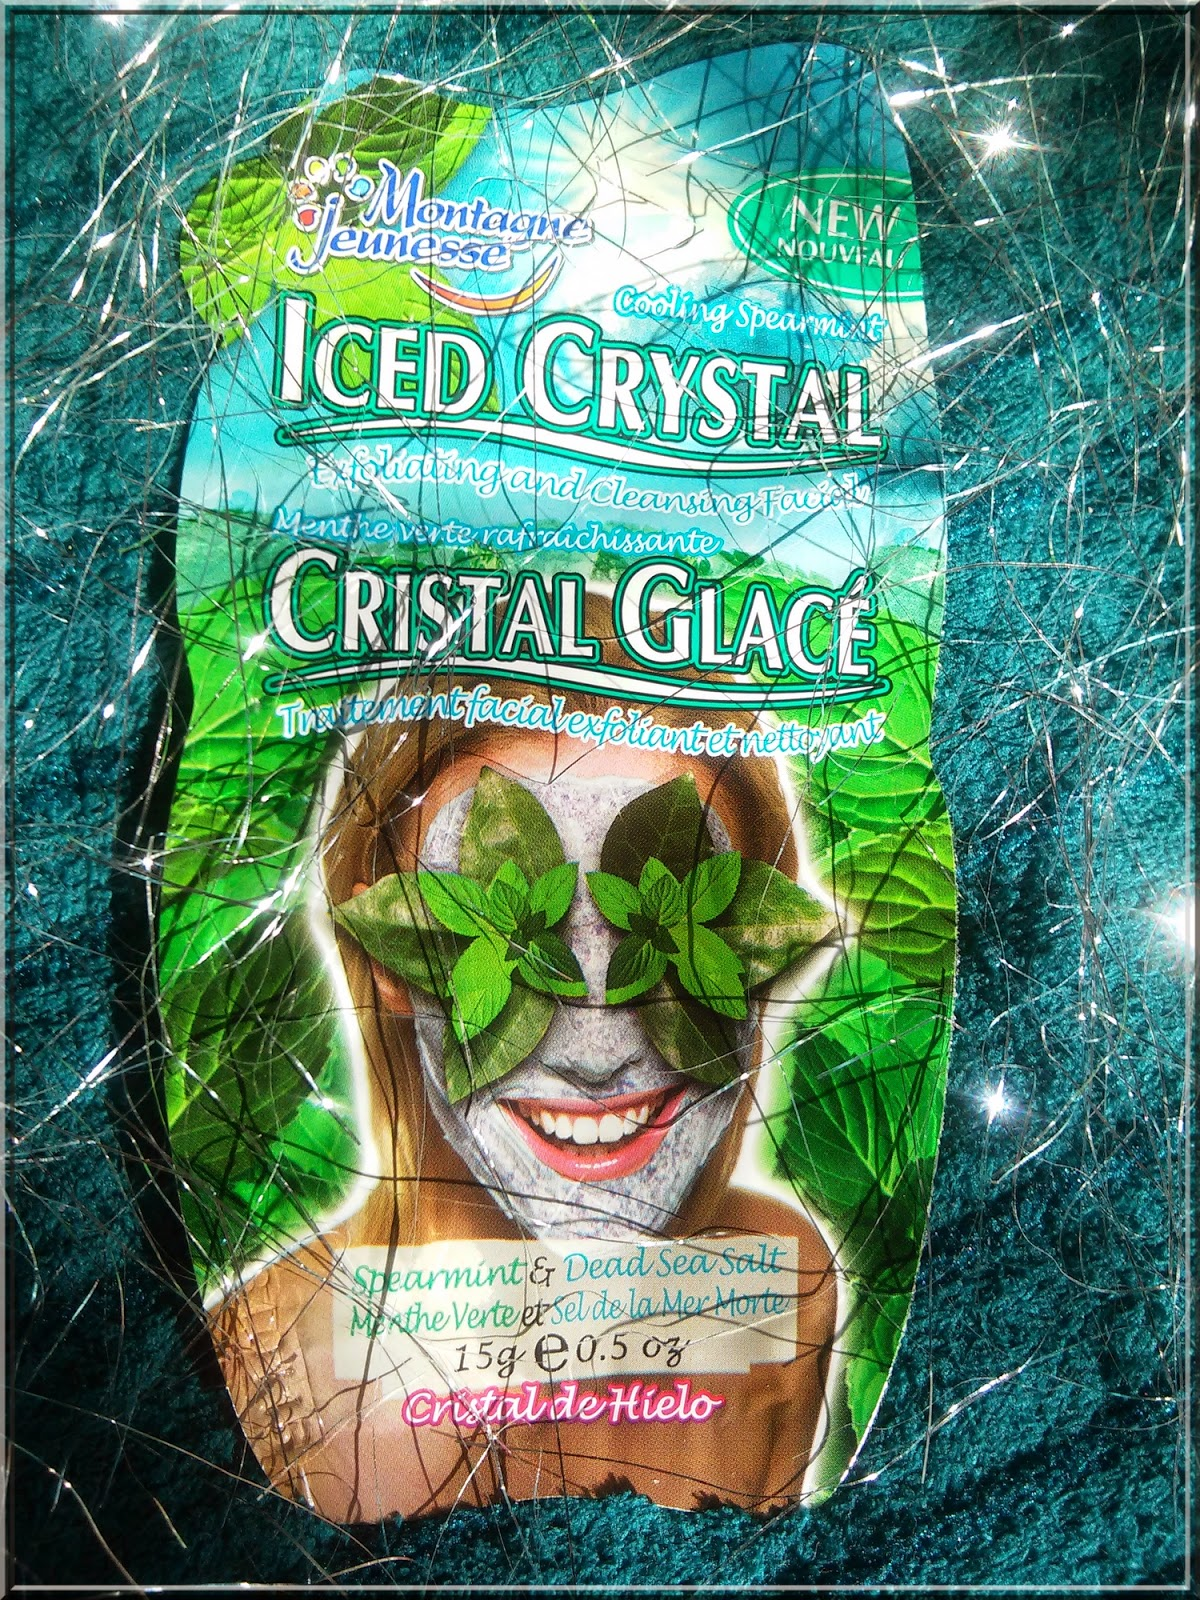 Montagne Jeunesse, Maseczka Iced Crystal z mentolem i miętą